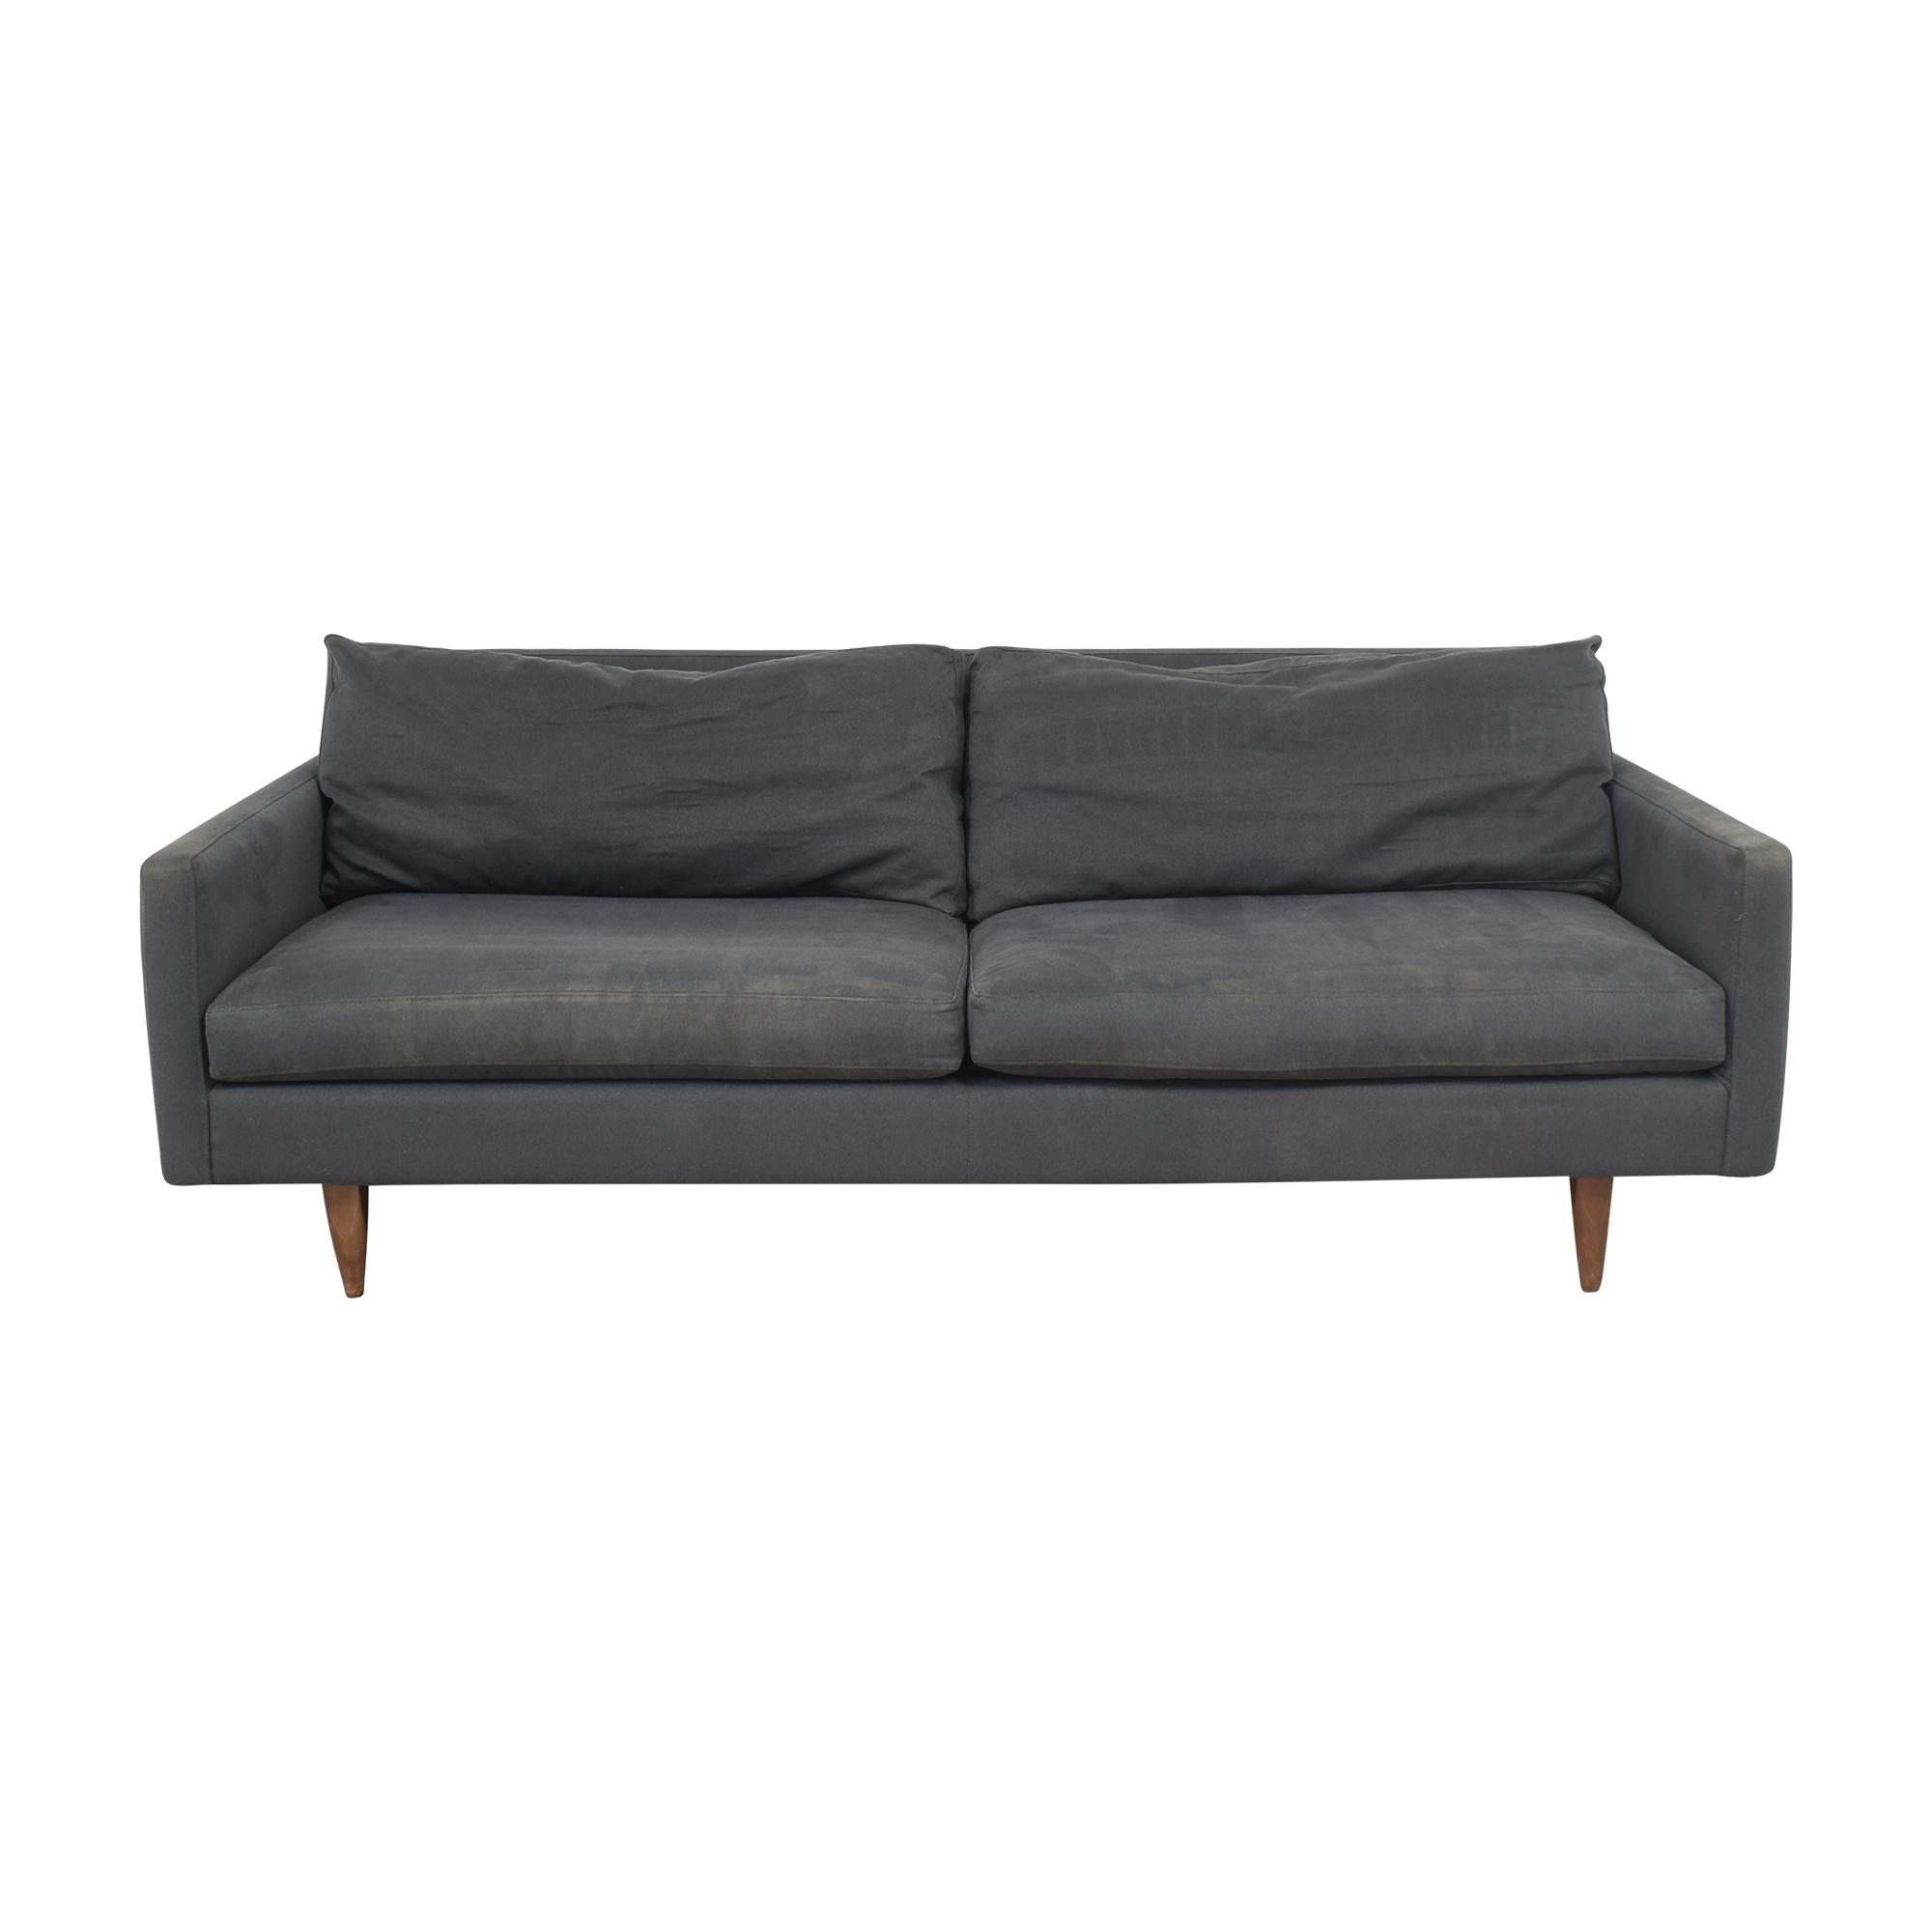 shop Room & Board Room & Board Jasper Two Cushion Sofa online